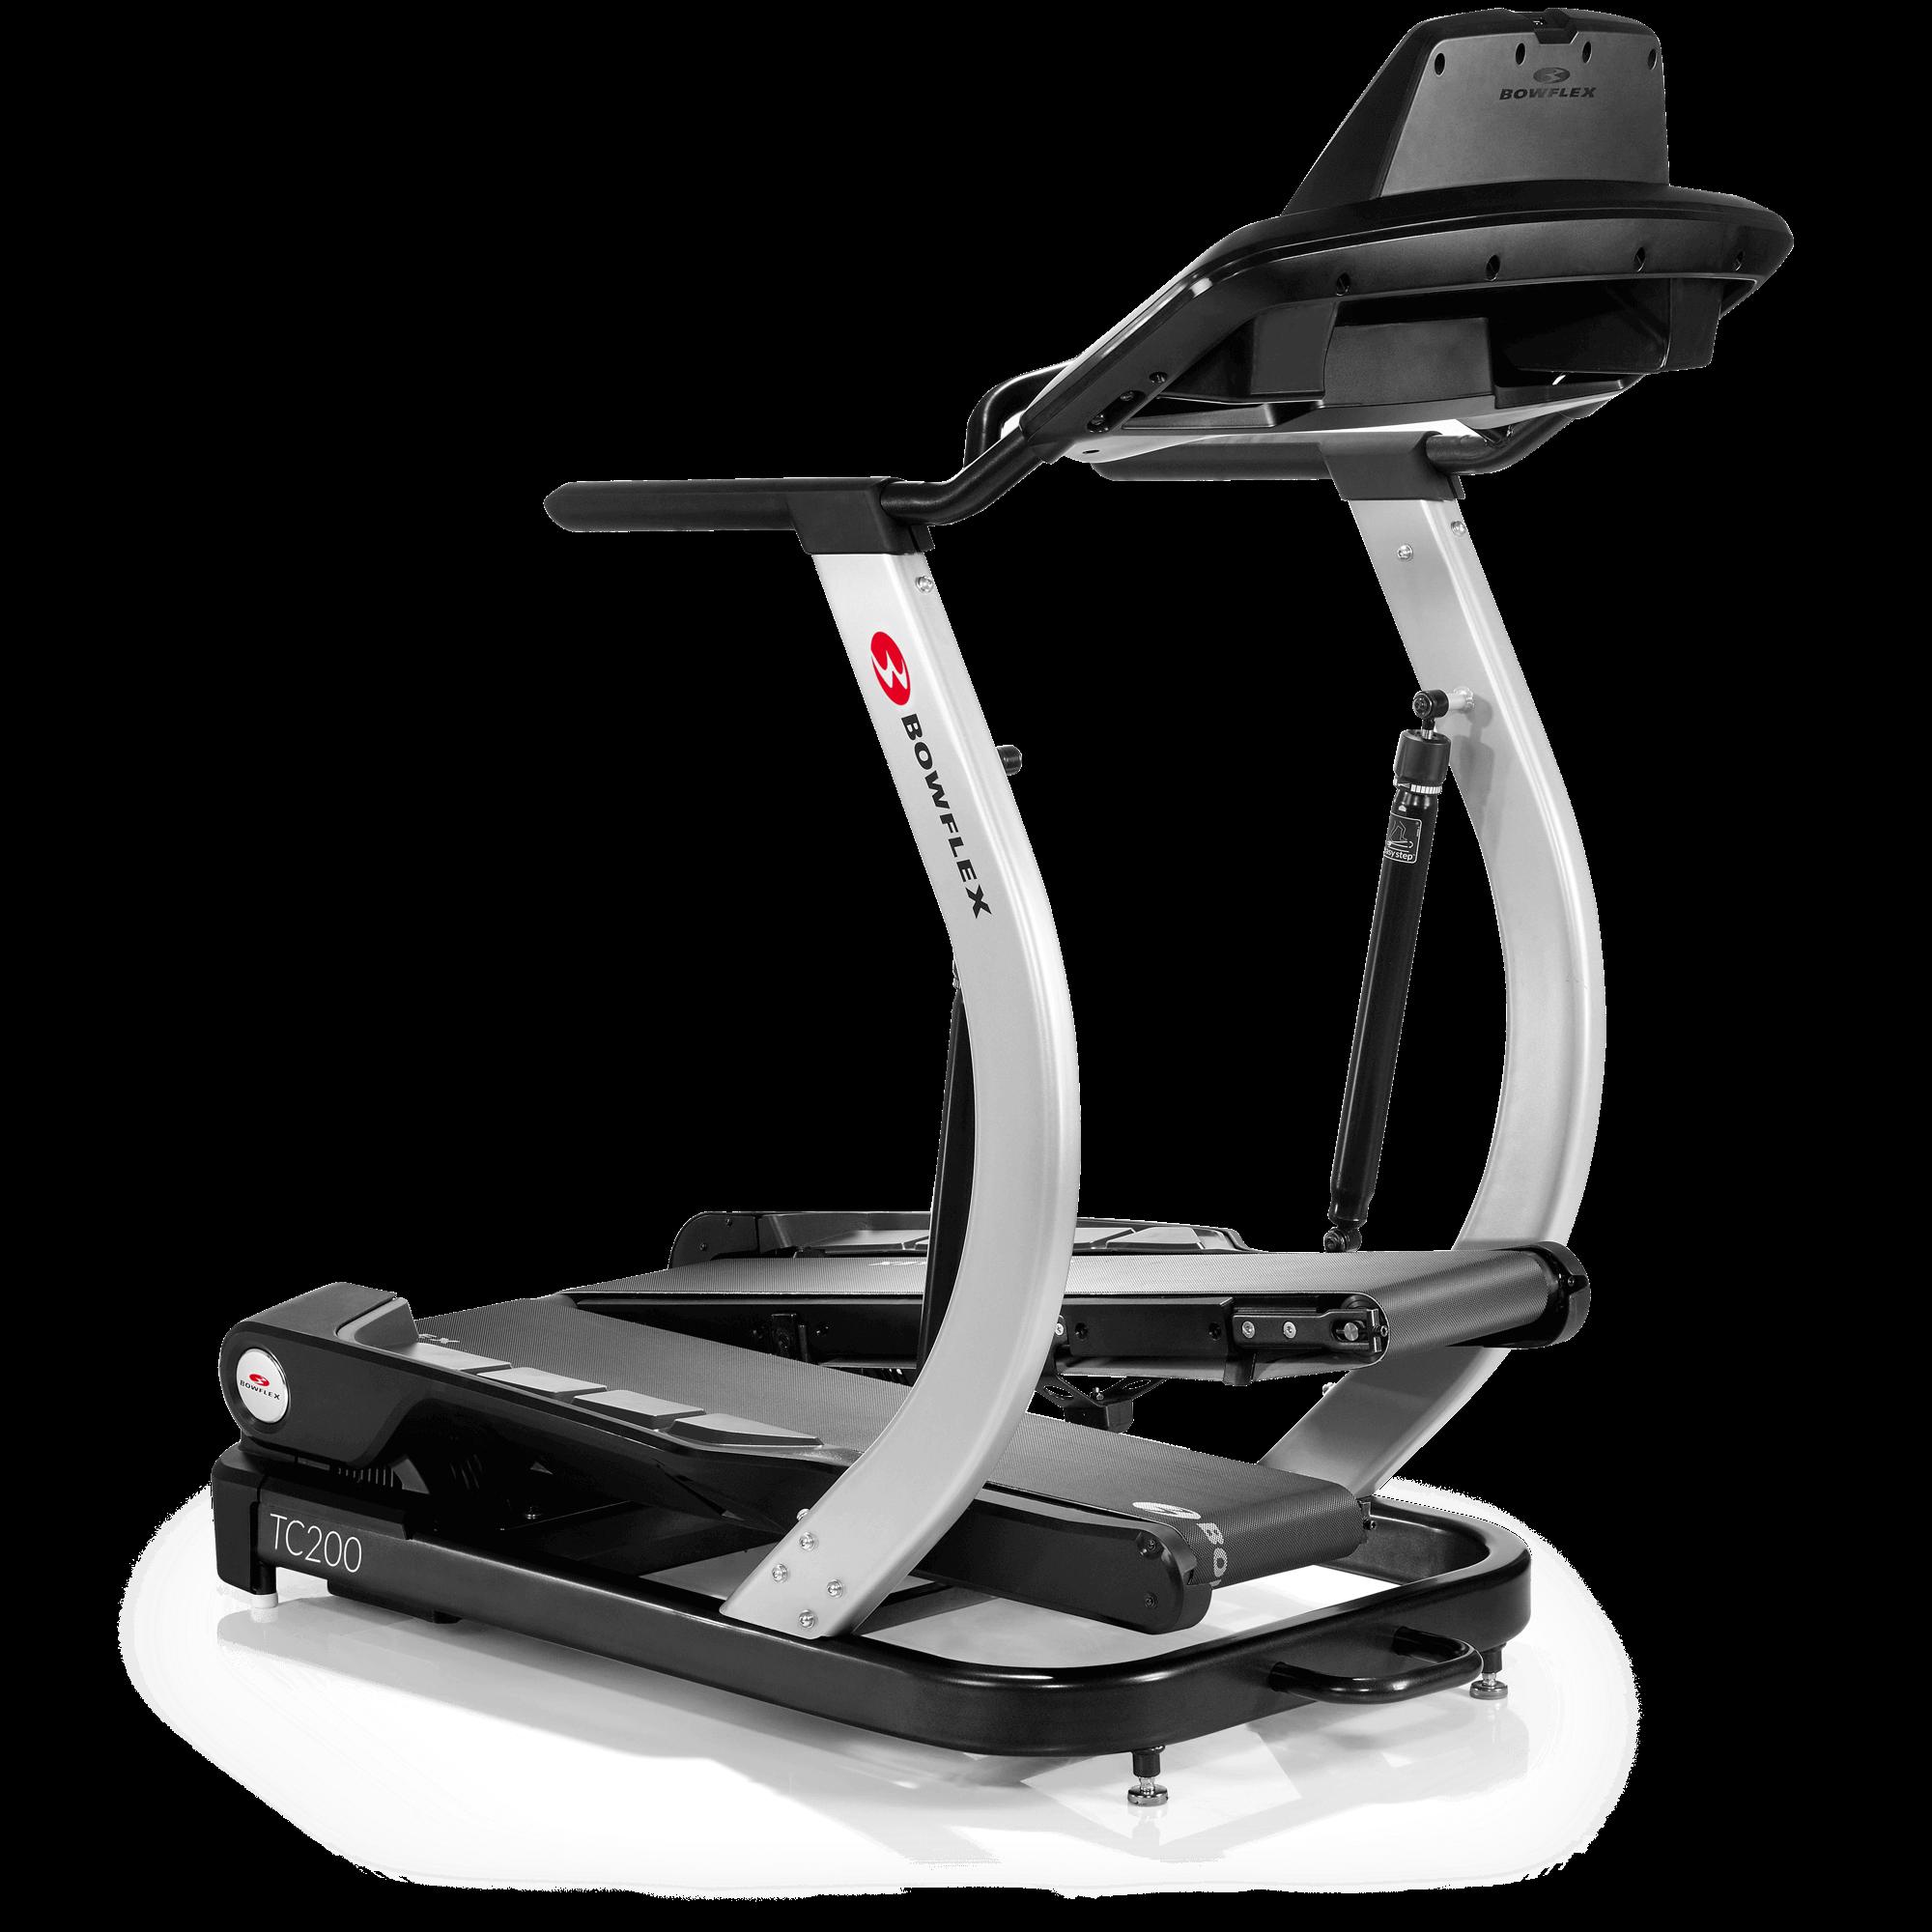 Nautilus Treadclimber Gebraucht: Bowflex TreadClimber TC200